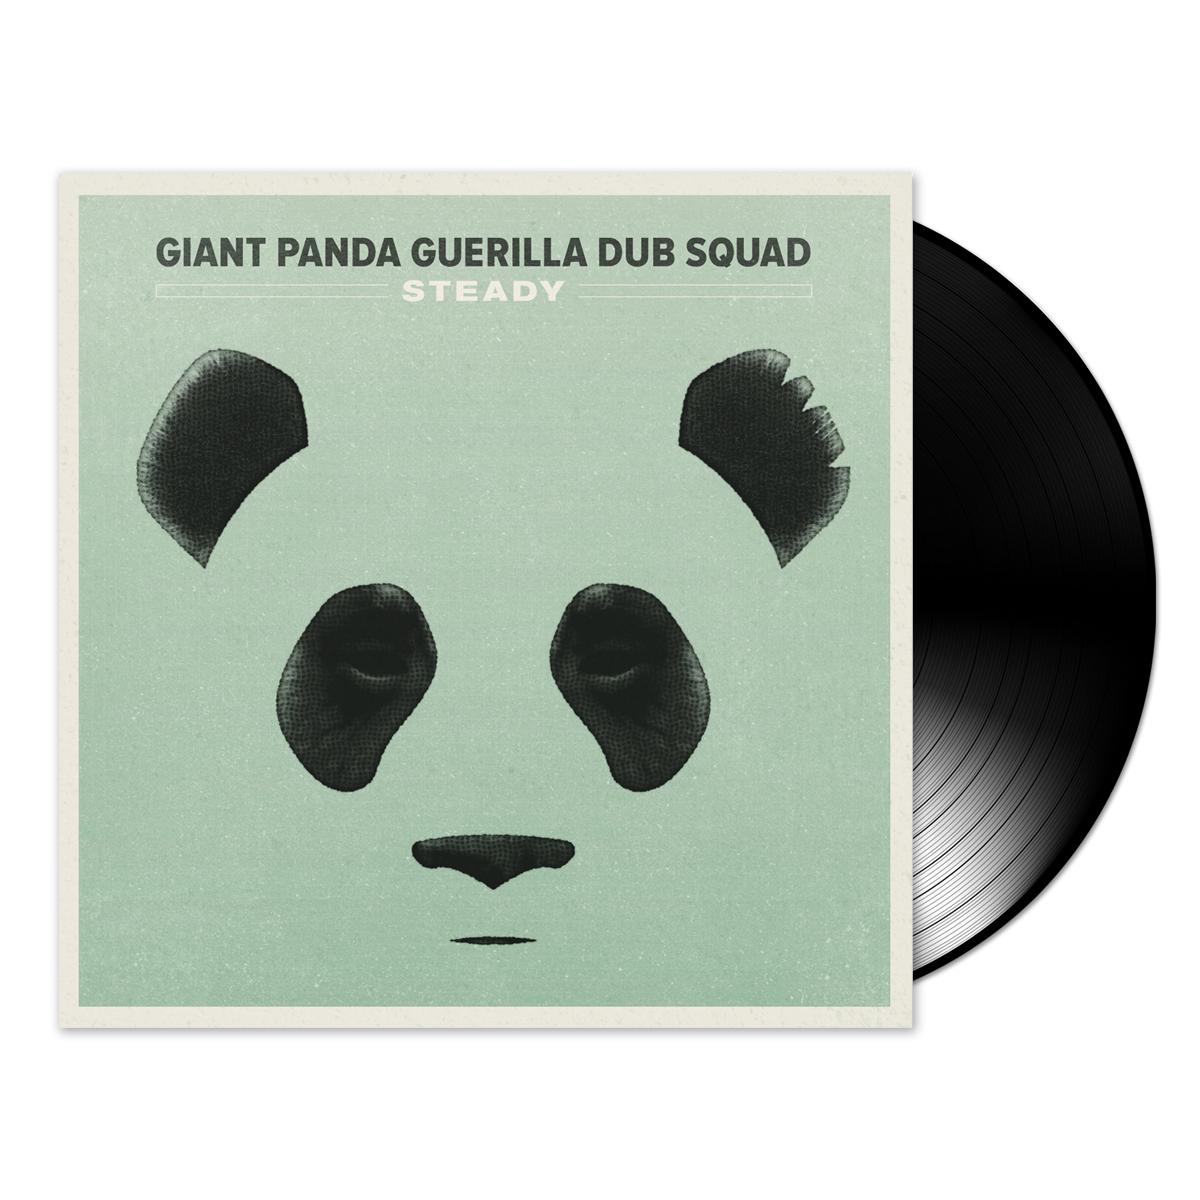 Giant Panda Guerilla Dub Squad – Steady 180 gram vinyl LP